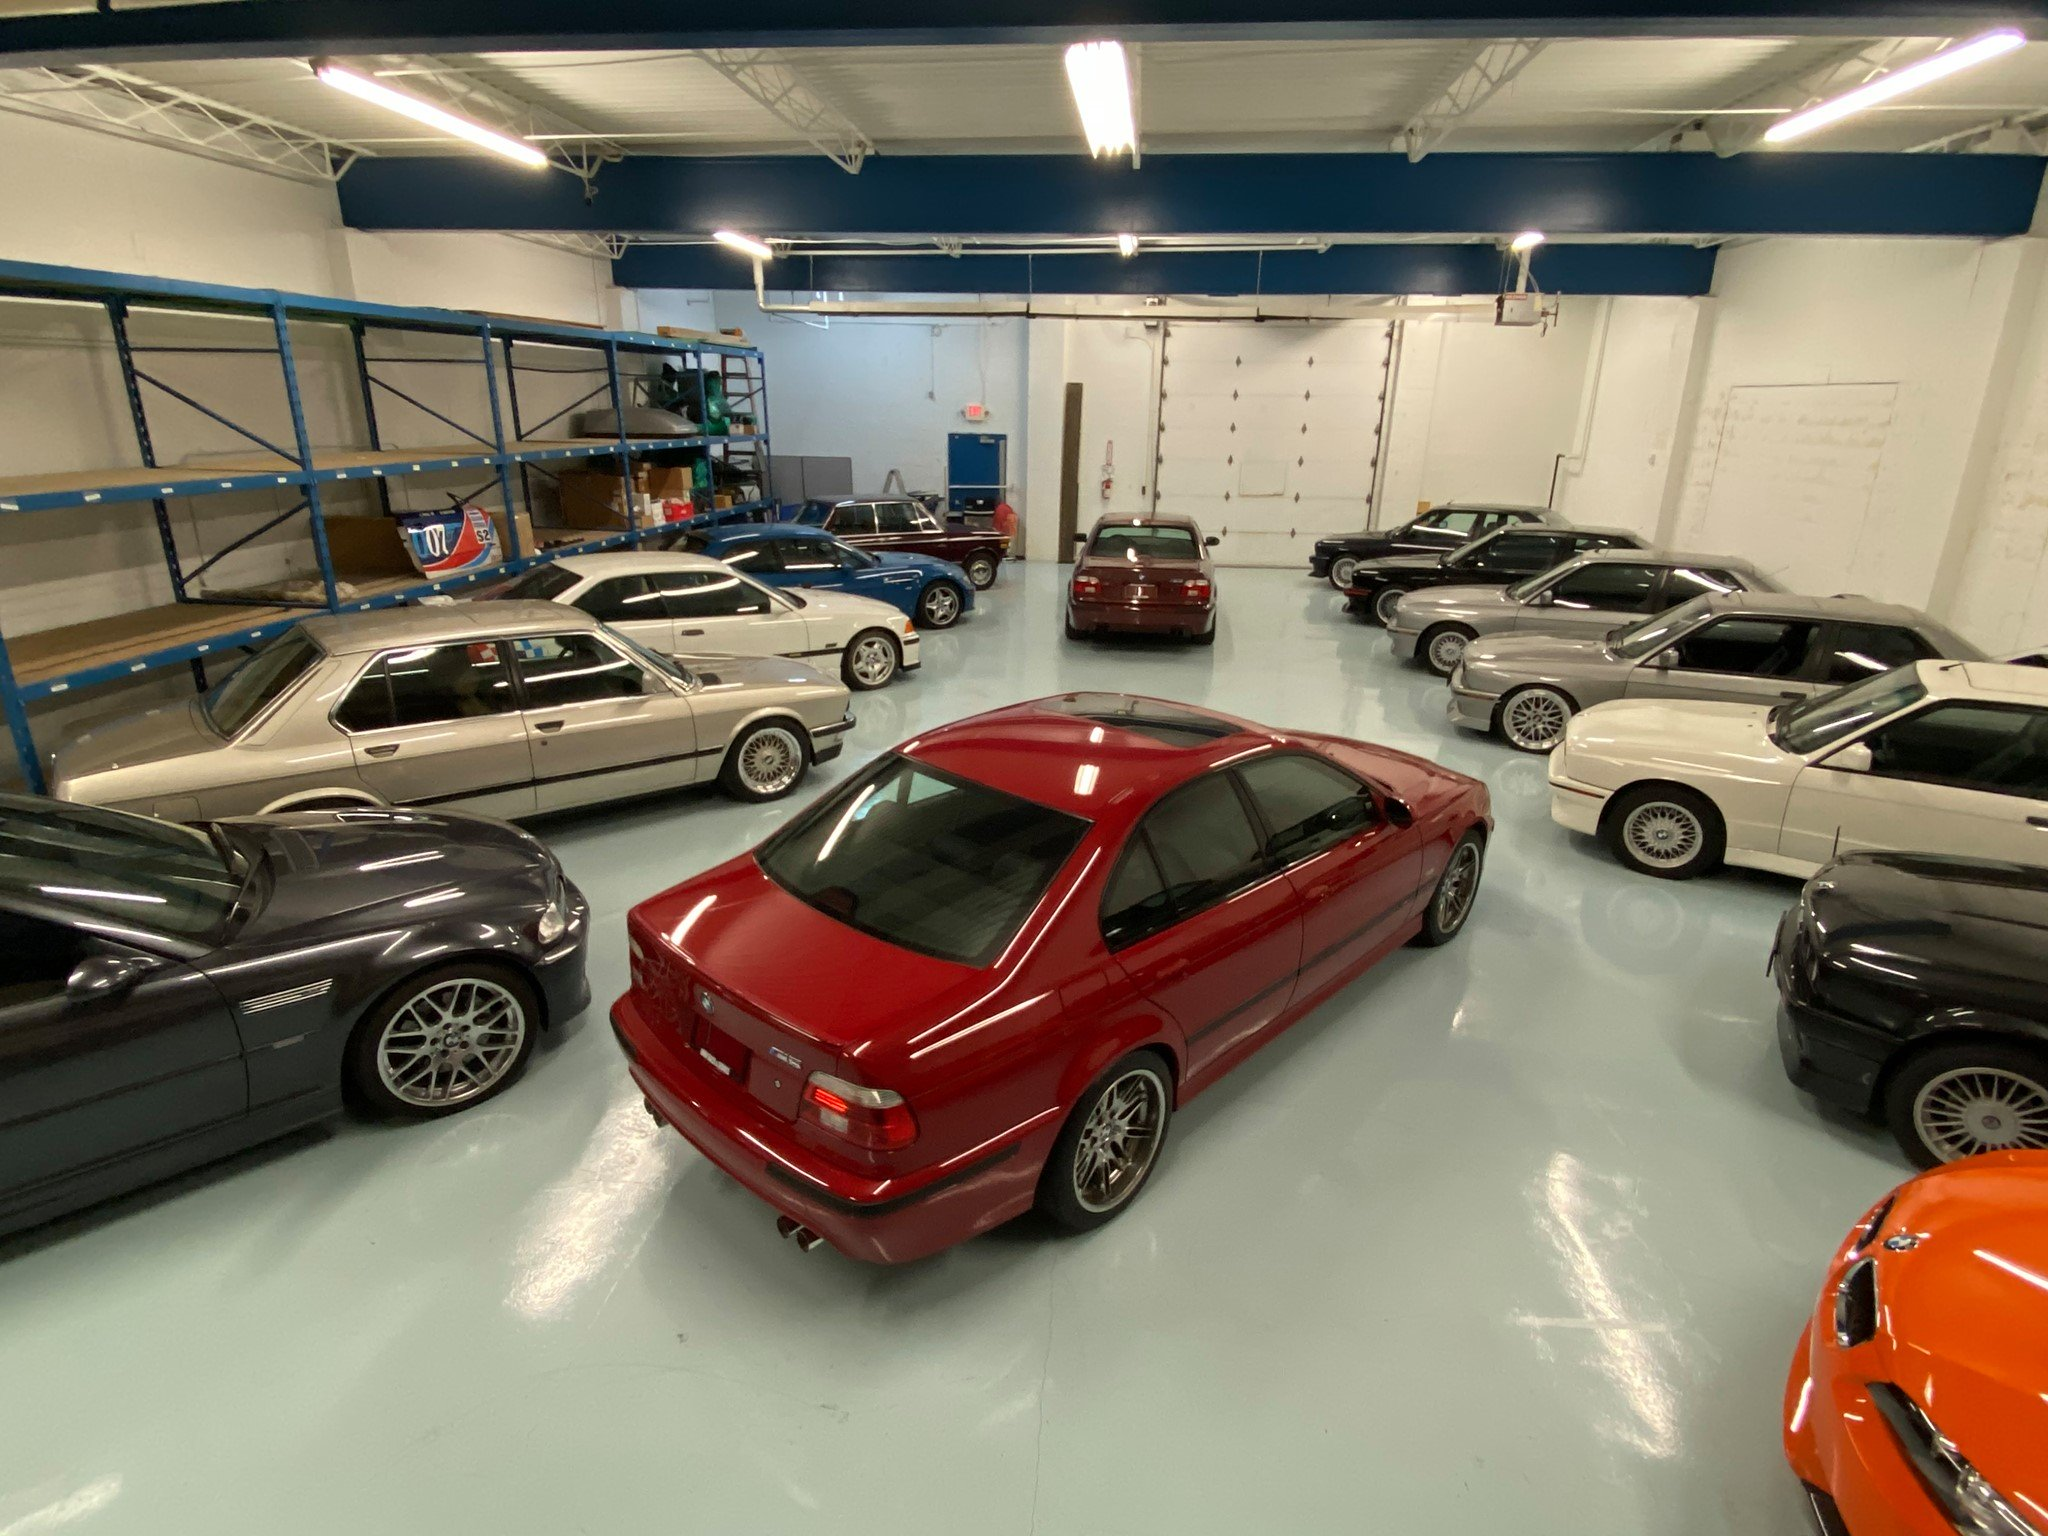 BMW_M5_E39_Imola_Red_0000